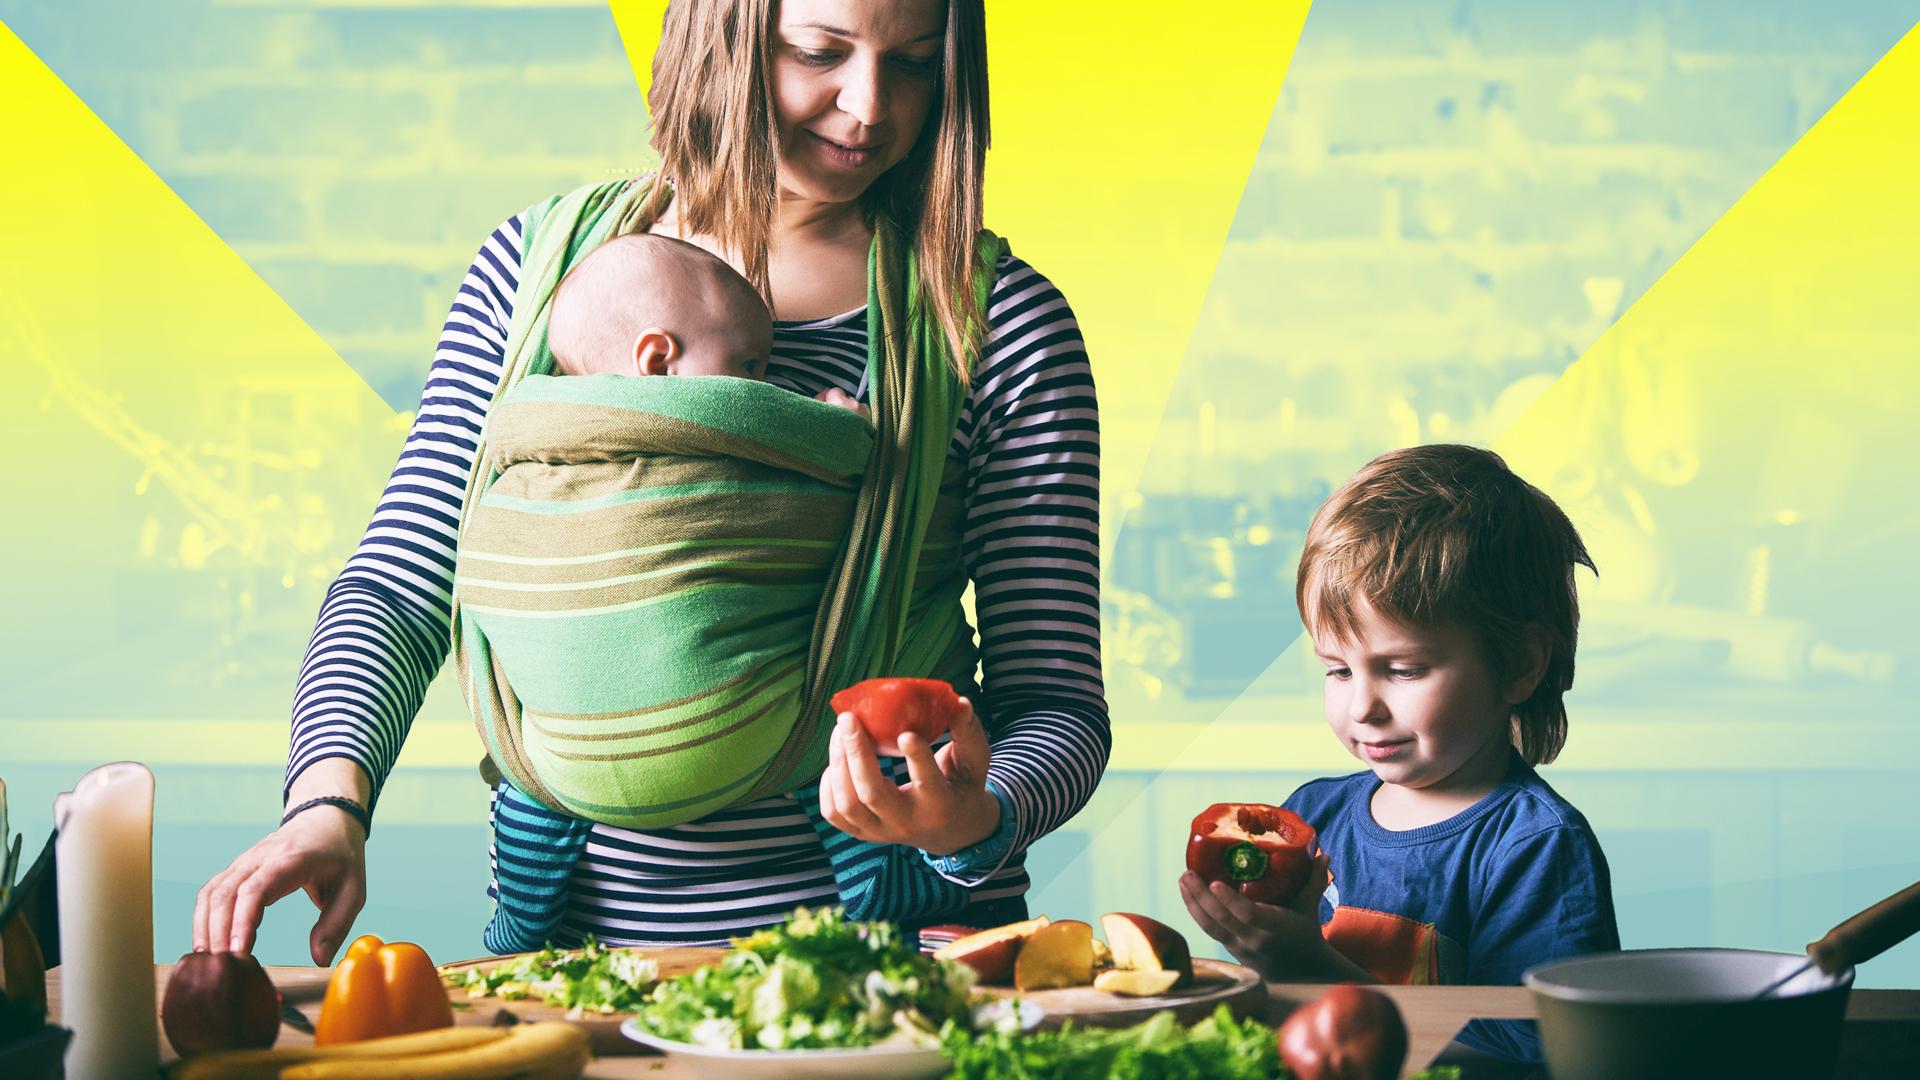 Surprising Way I Got My Kid to Eat Vegetables